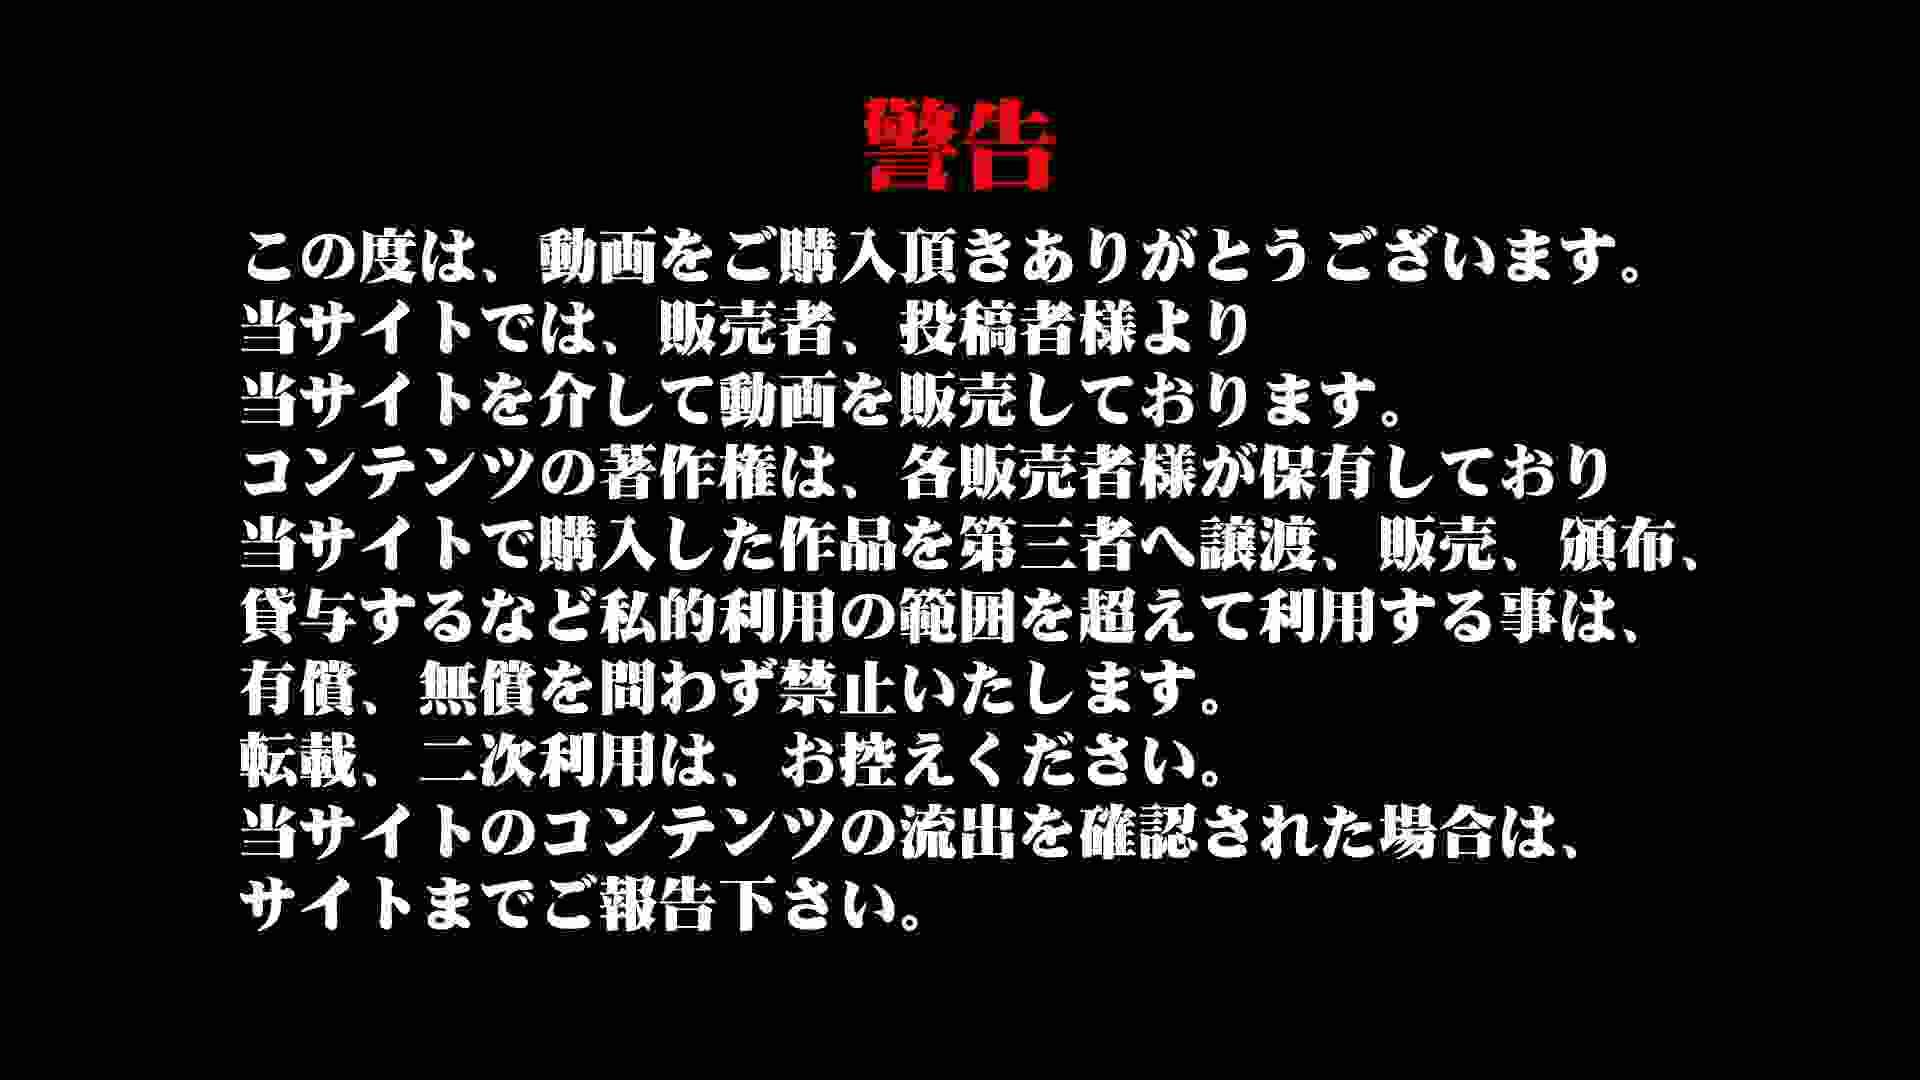 Aquaな露天風呂Vol.867潜入盗撮露天風呂参判湯 其の二 盗撮動画 | 露天風呂  9枚 1